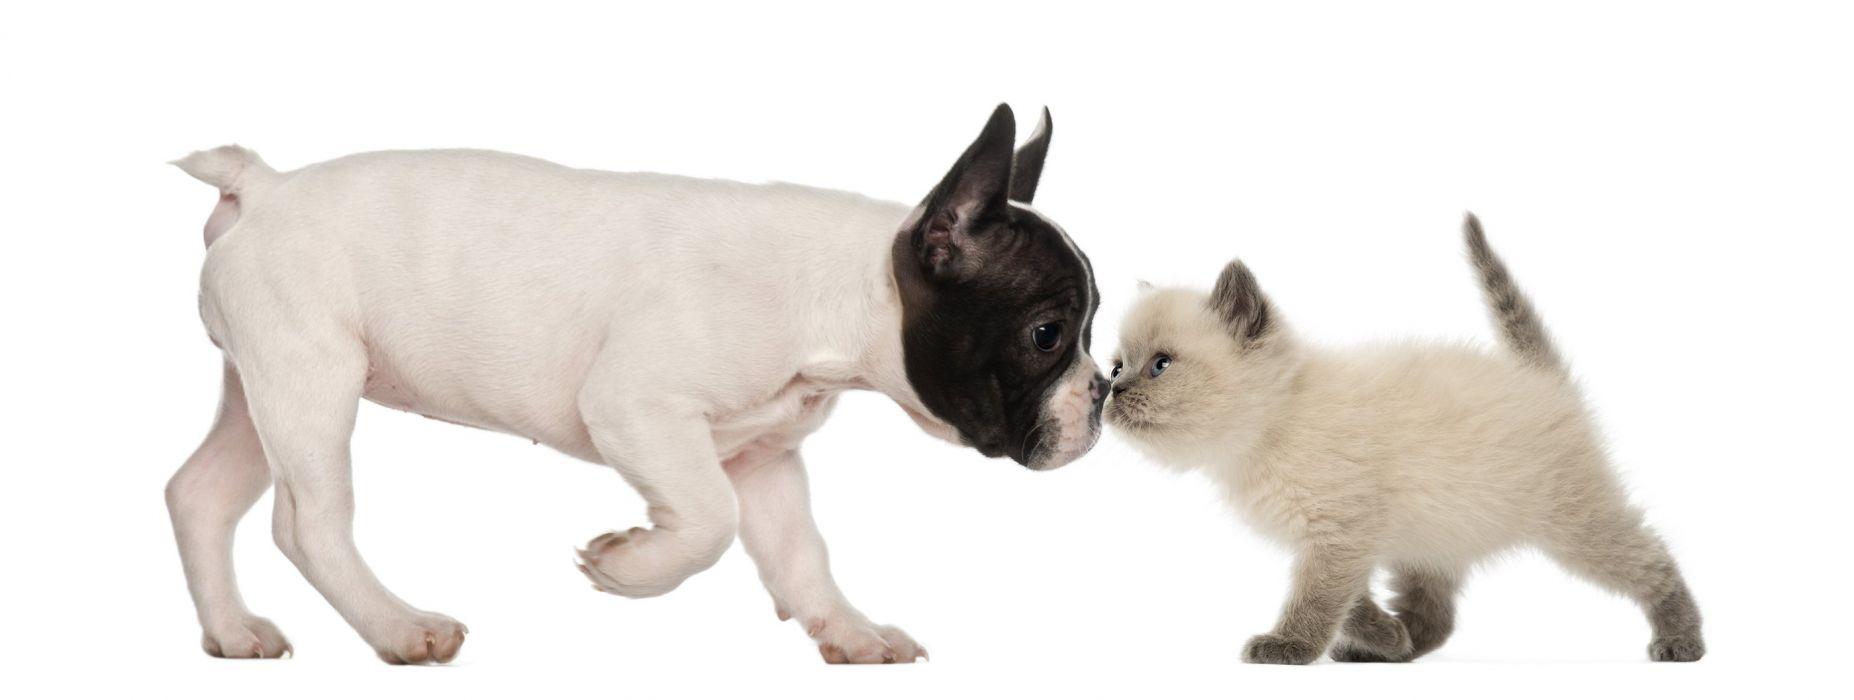 BULLDOG dog dogs canine puppy baby kitten cat wallpaper